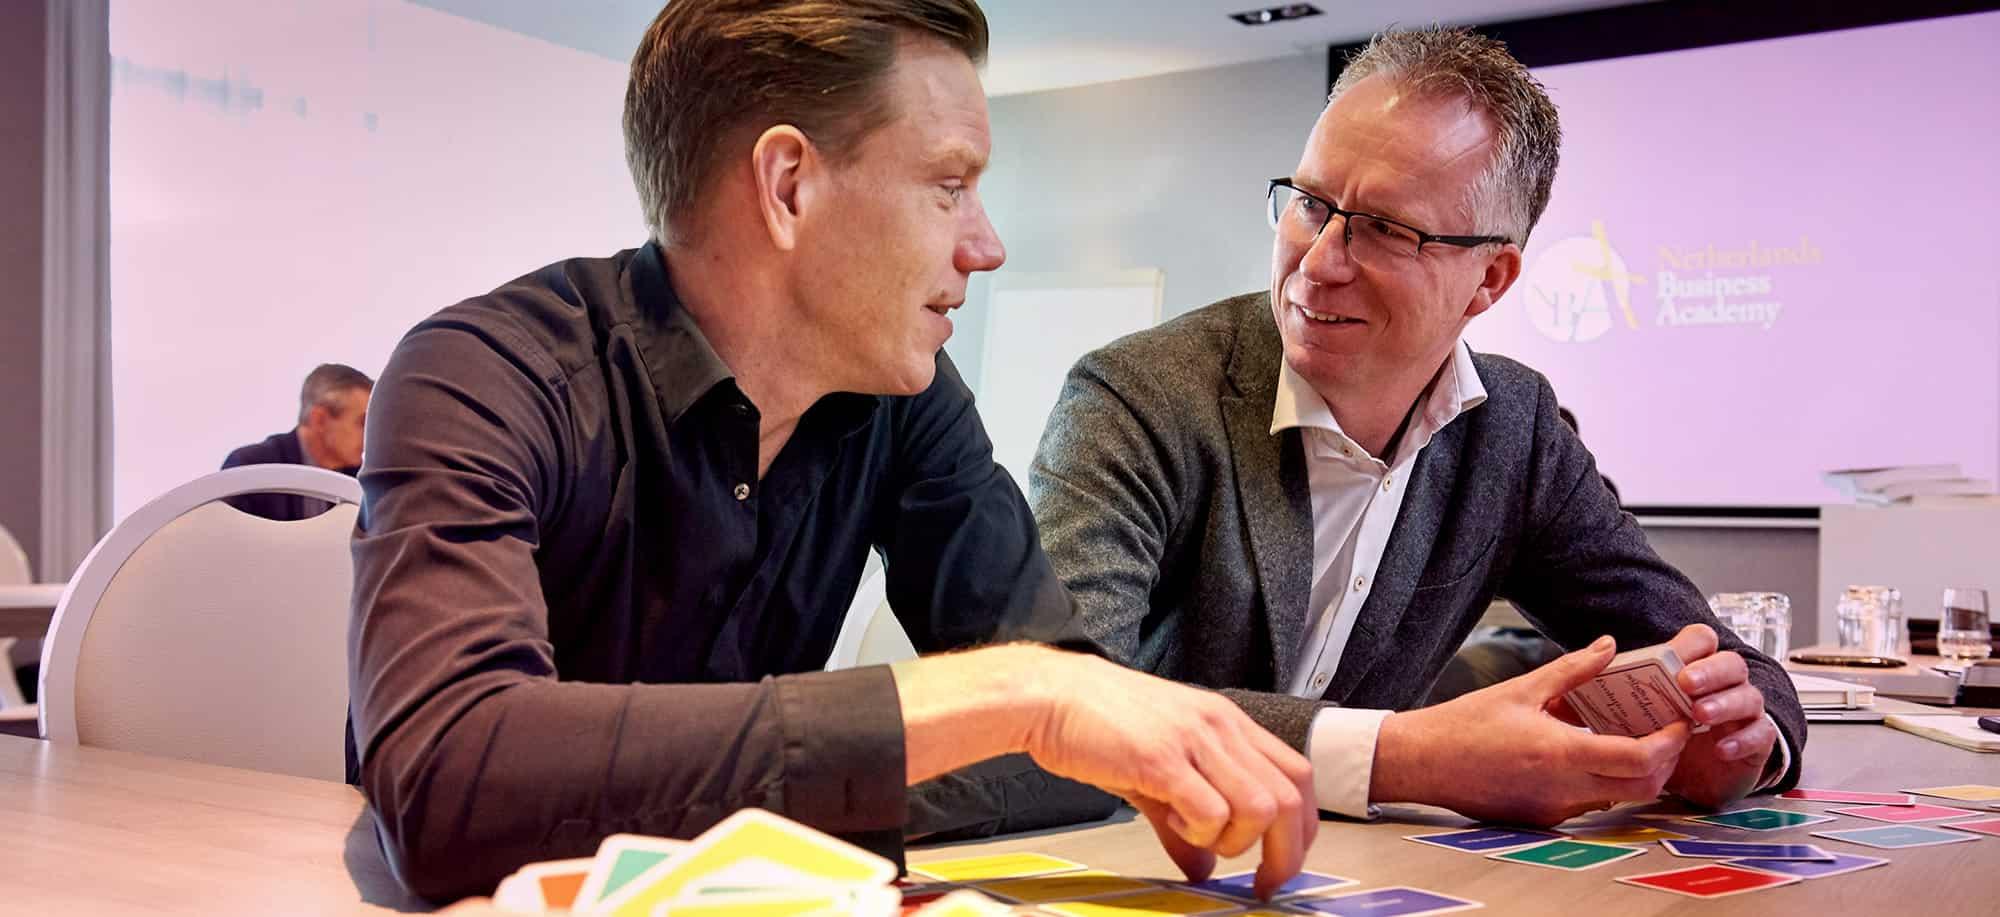 Executive MBA opleiding Leading 21st Century Learning